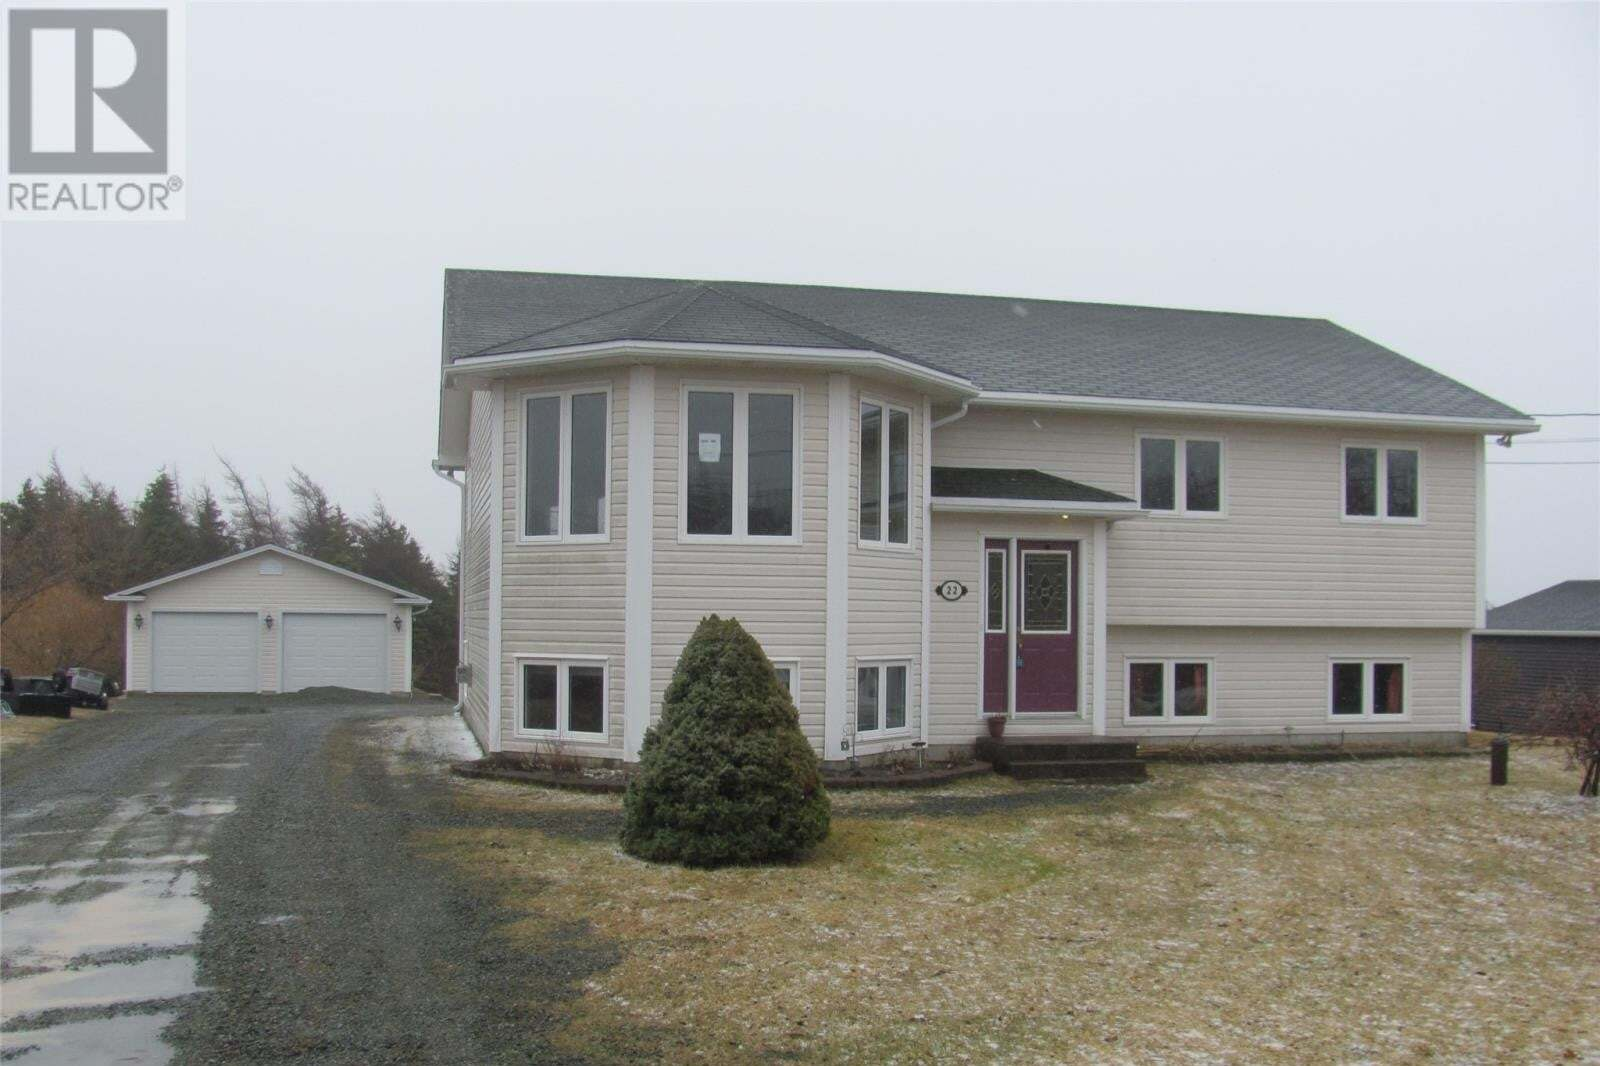 House for sale at 22 Adams Pl Flatrock Newfoundland - MLS: 1212496